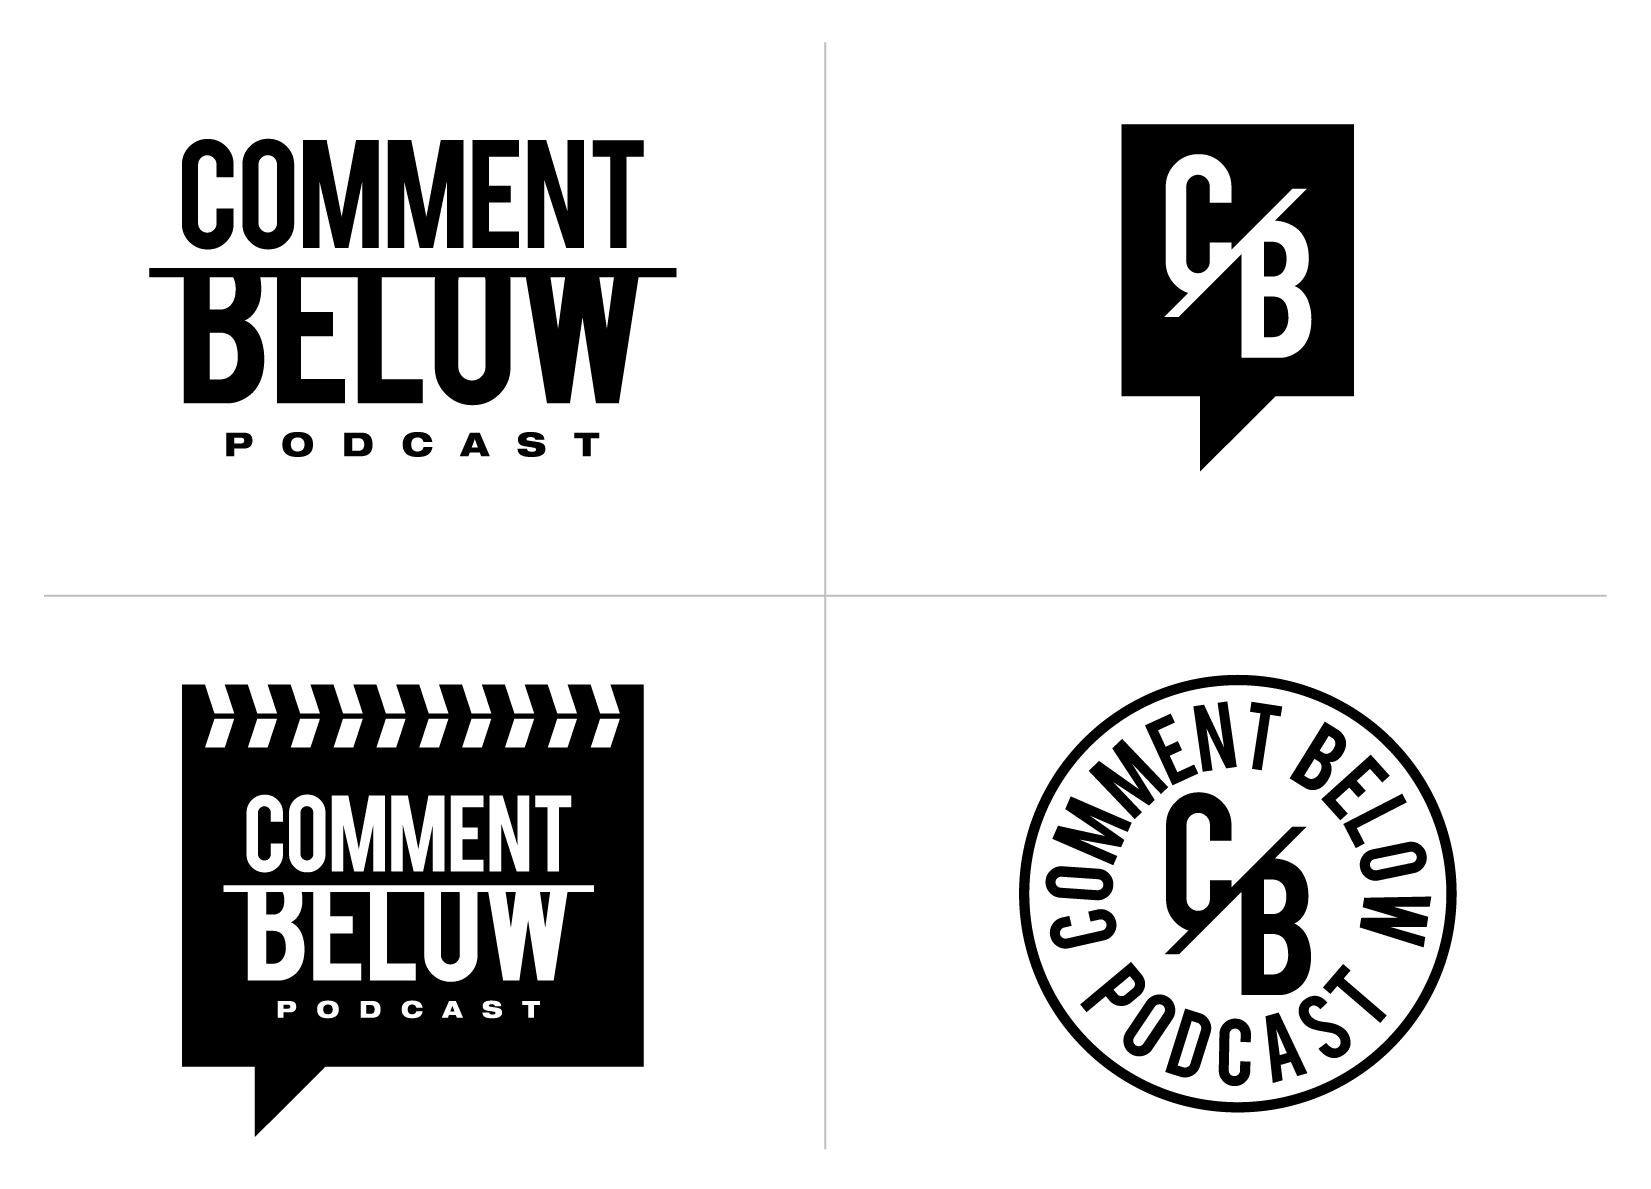 comment_below_logo_comp3.jpg